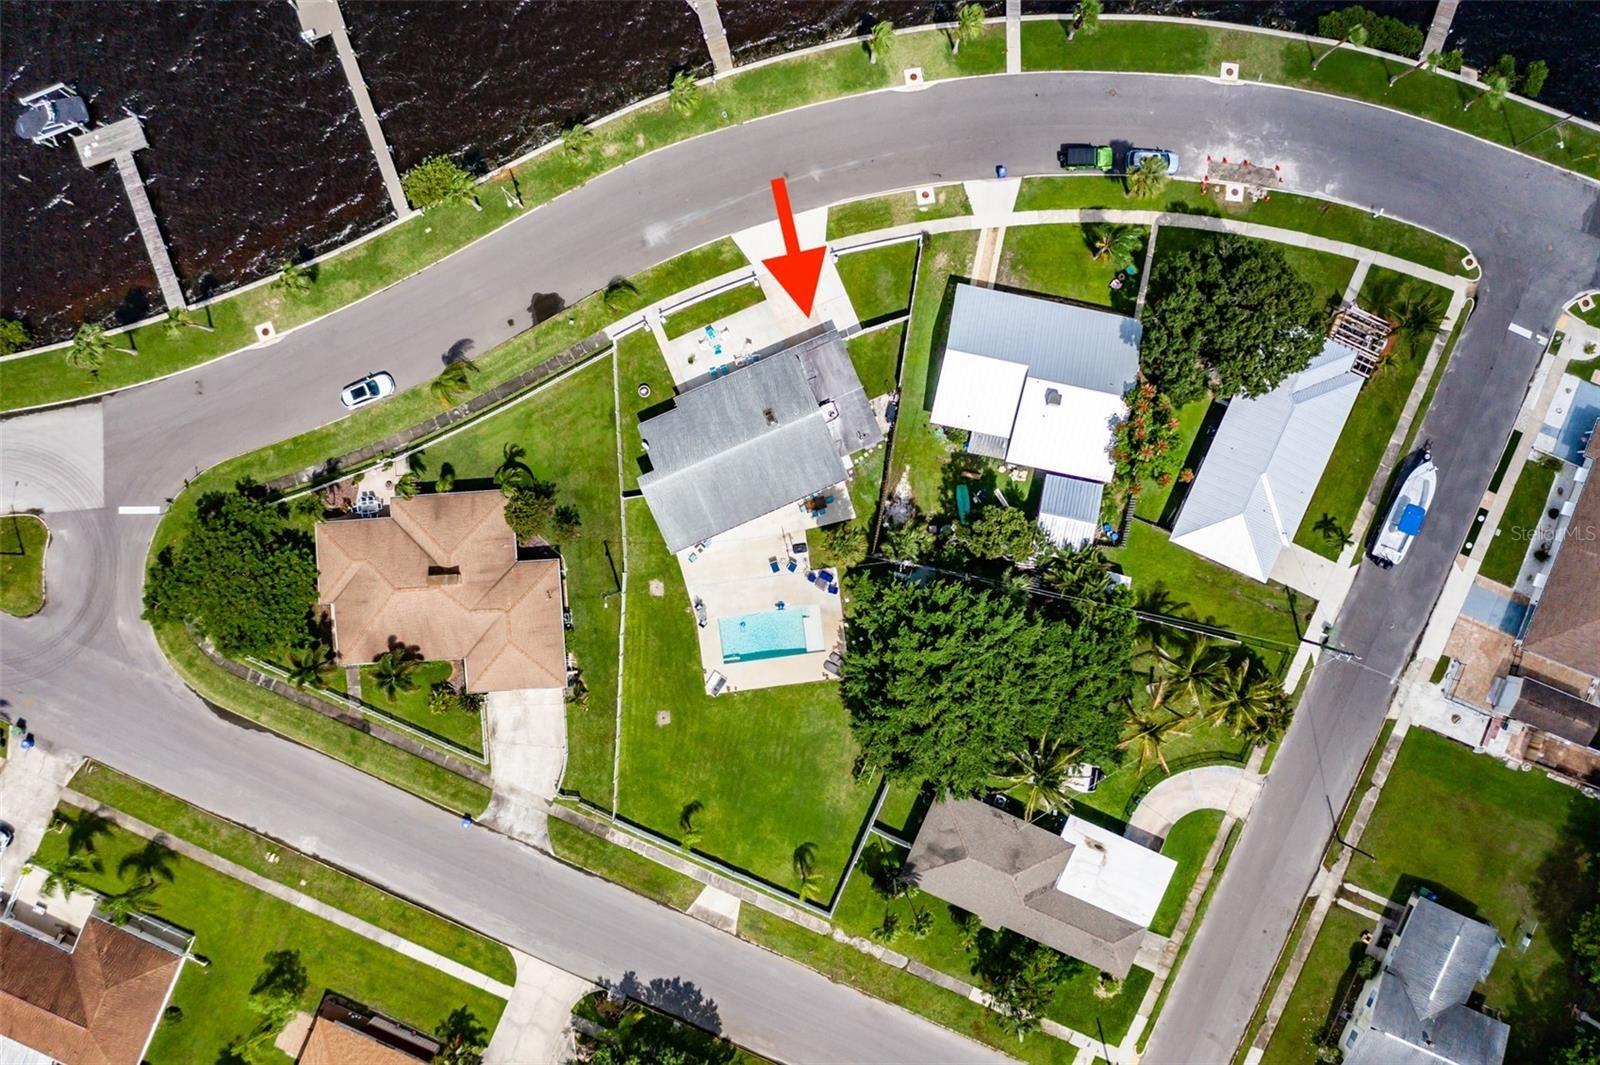 Photo of 1830 RIVERSIDE DRIVE E, BRADENTON, FL 34208 (MLS # U8136529)